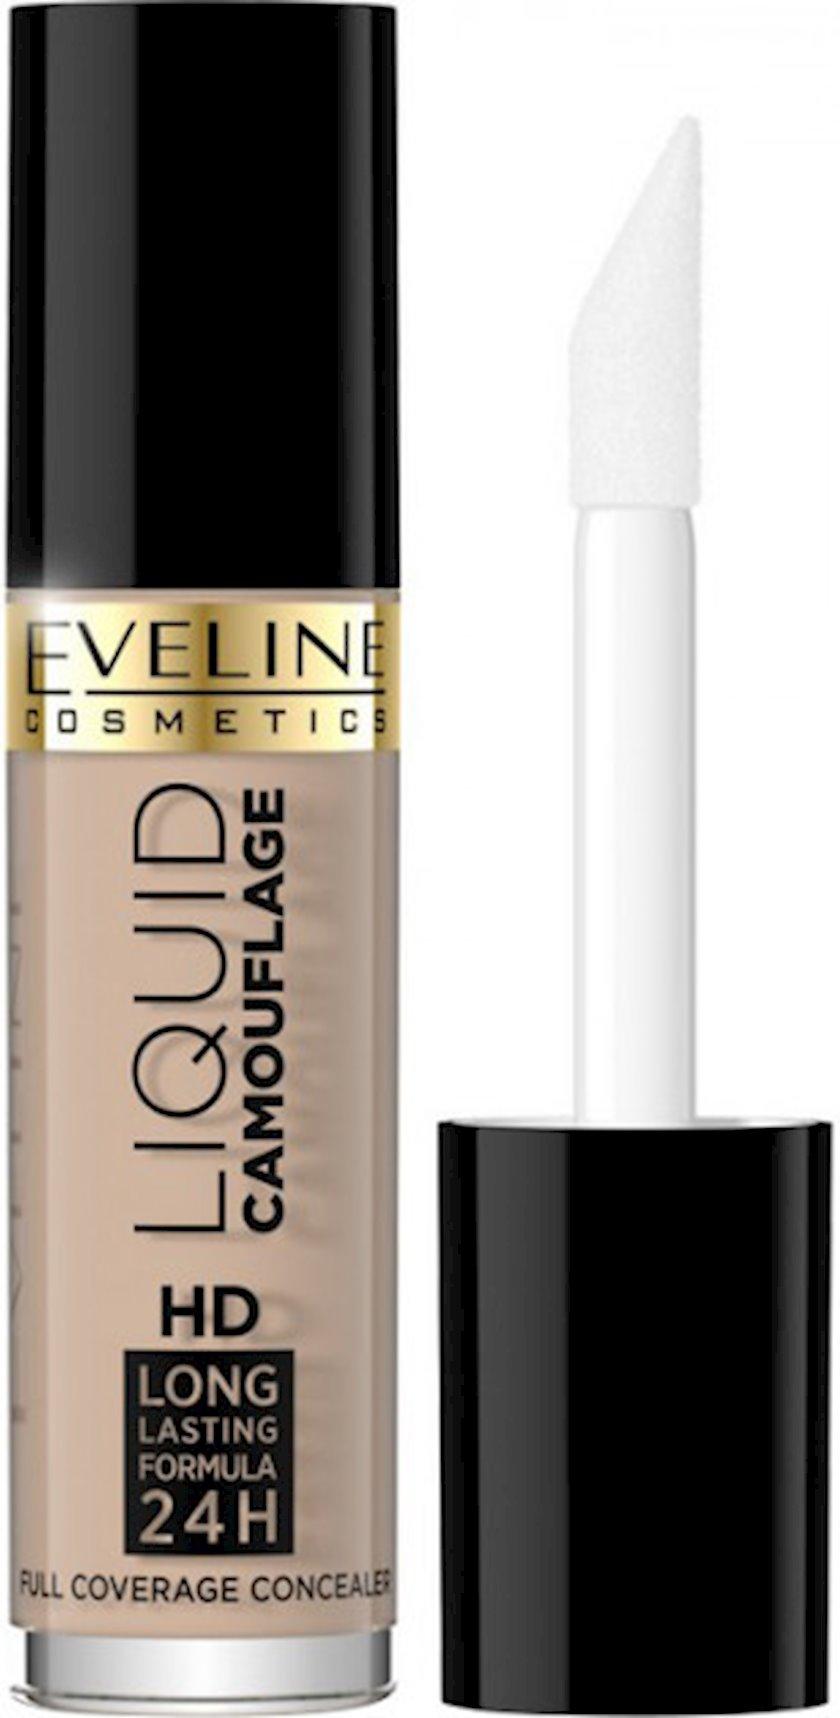 Üz üçün korrektor Eveline Cosmetics Liquid Camouflage HD Long Lasting Formula 24h №05 Porcelain 5 ml